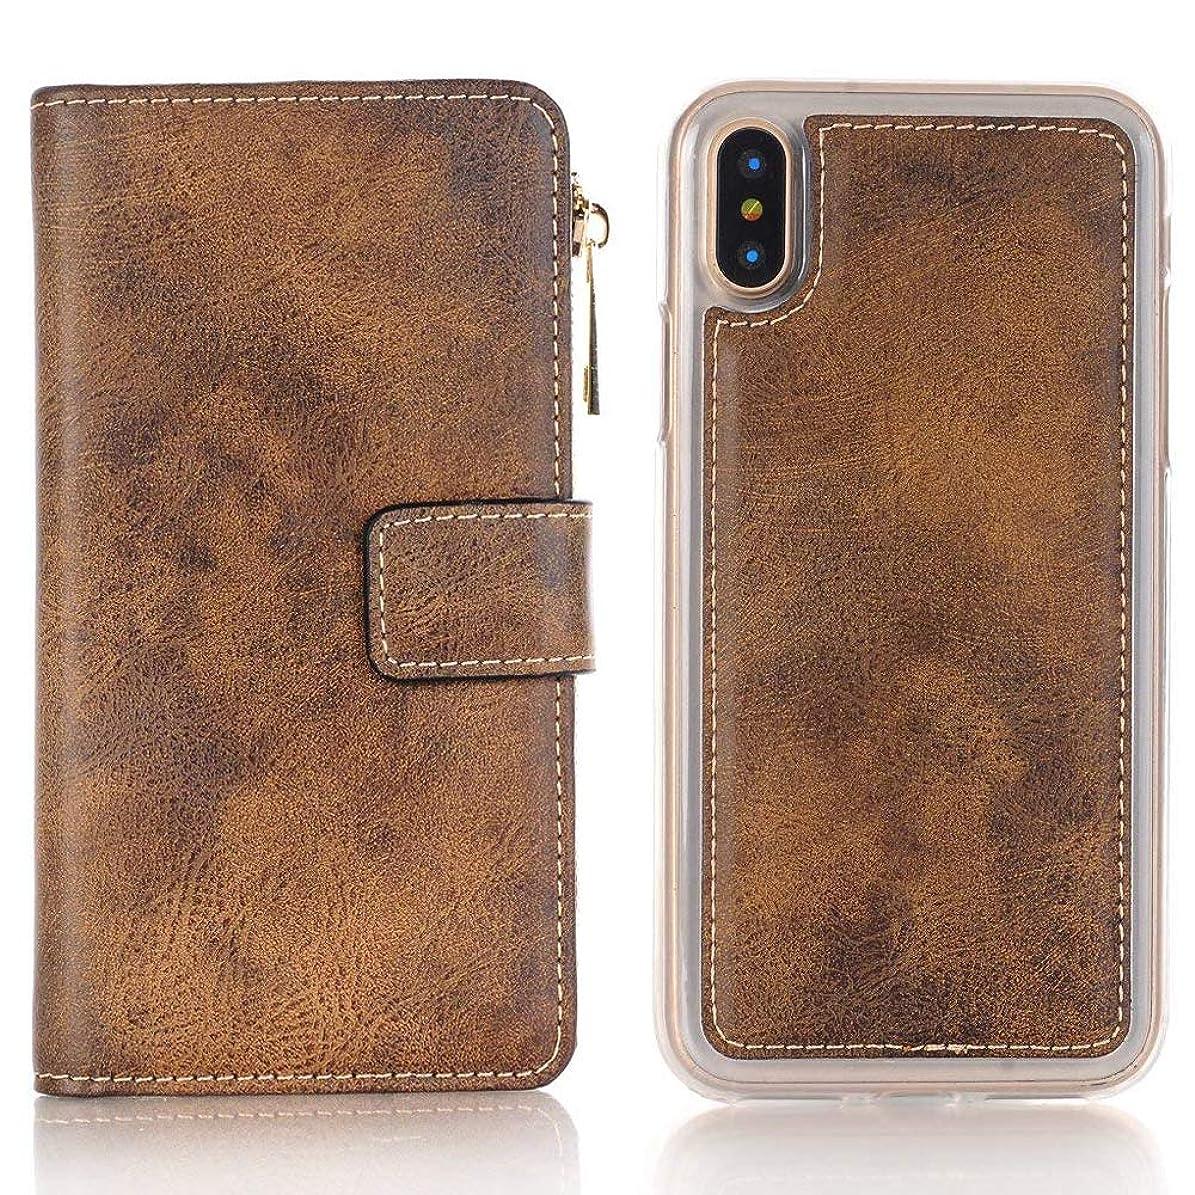 iPhone X ケース 手帳型 INorton 全面保護カバー 耐衝撃 レンズ保護 カード収納 分離式 高品質レザー シリコン 軽量 マグネット式(ブラウン)